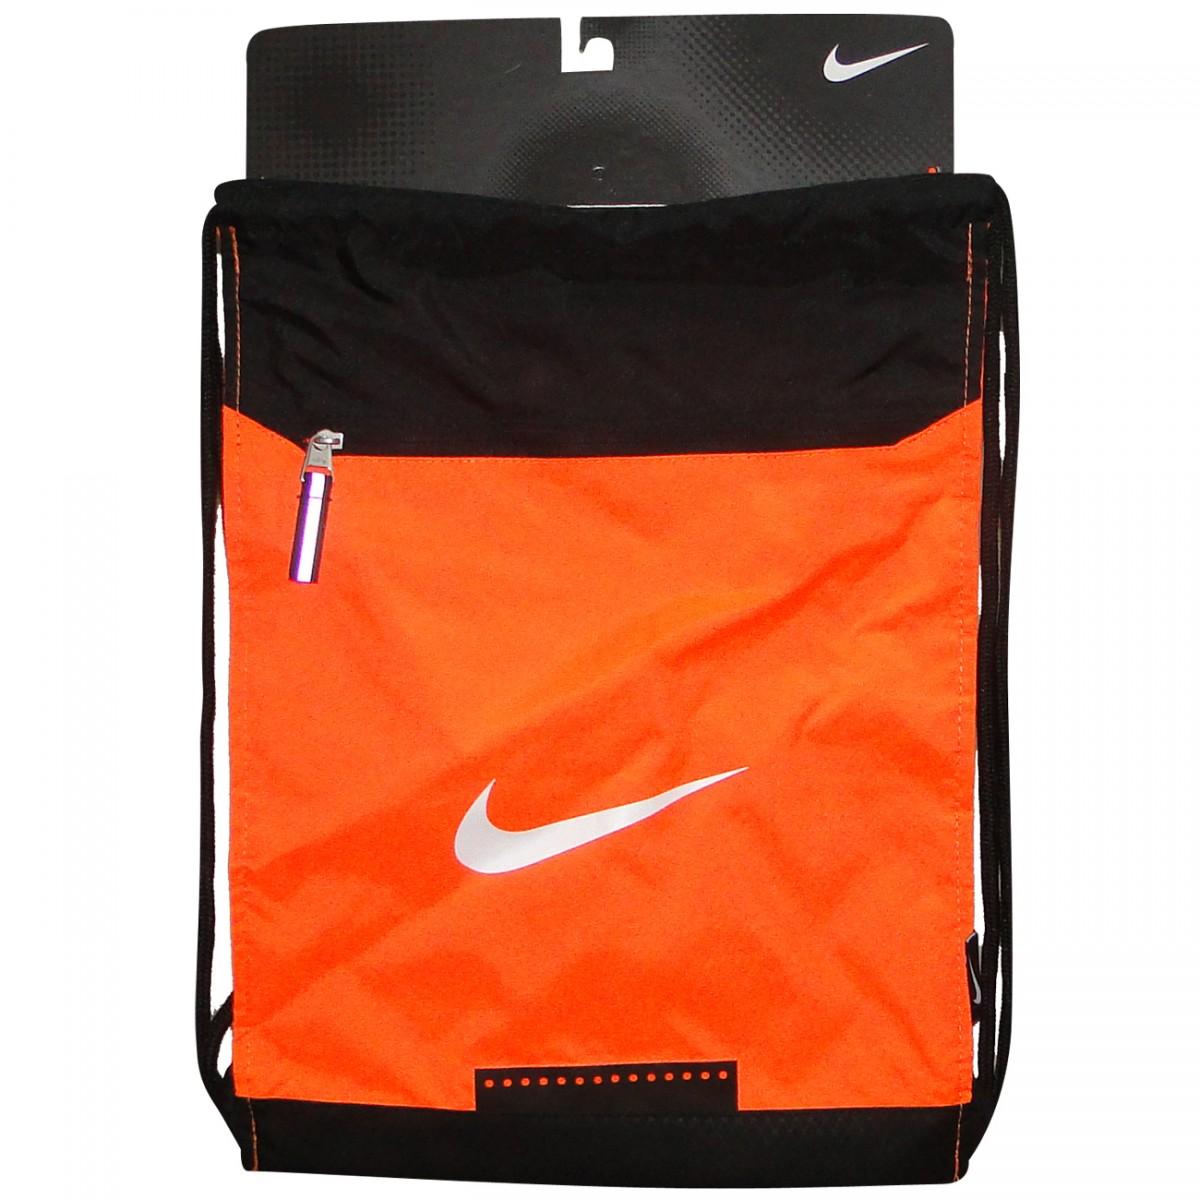 077f15aa9 Sacola Nike BA4694 BA4694 018 - Laranja/Preto - Chuteira Nike ...